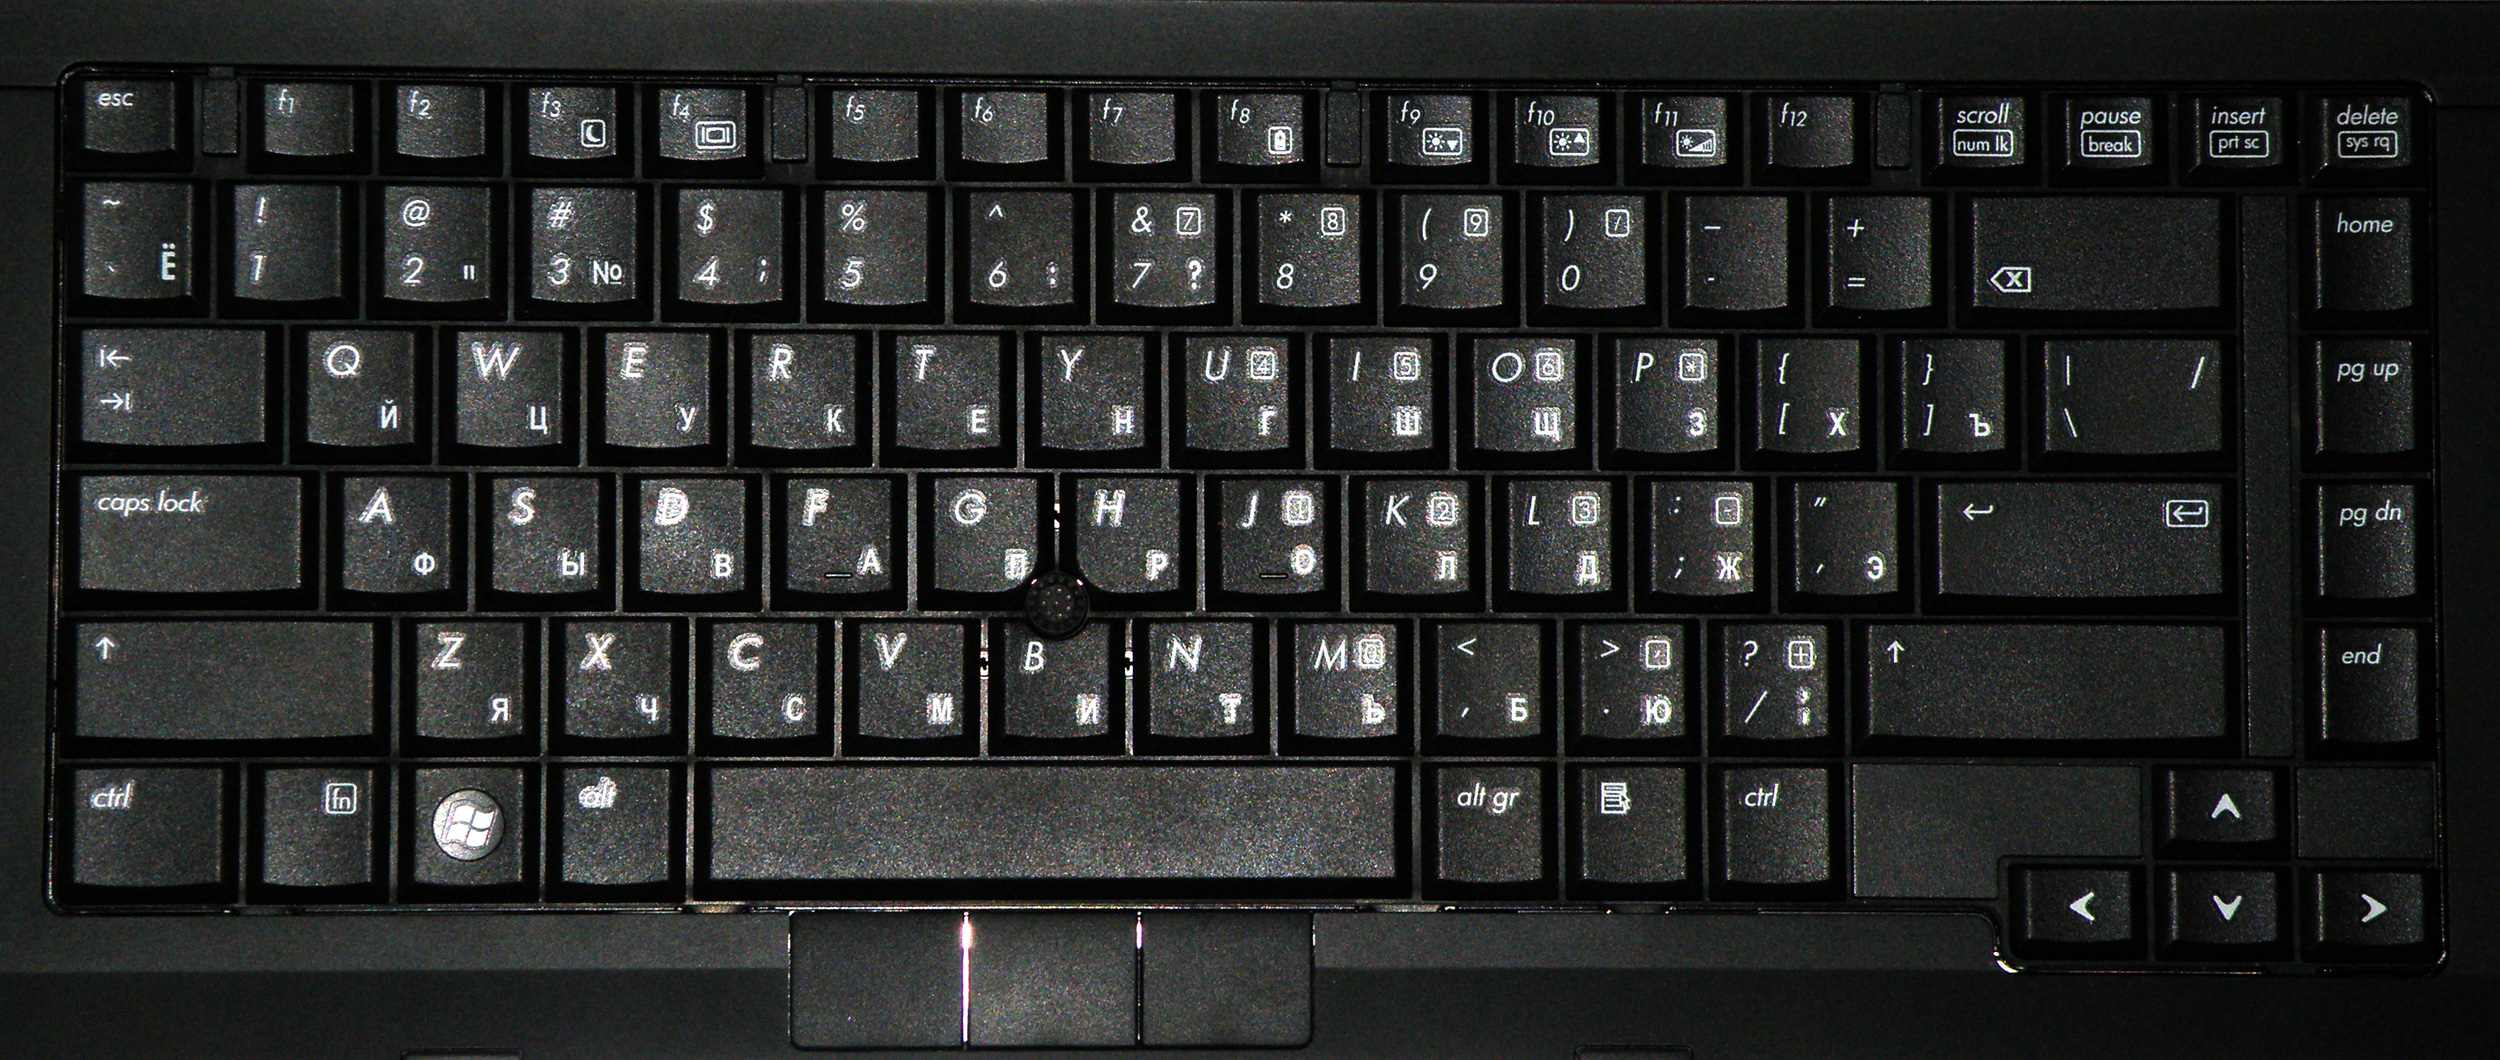 Картинки клавиатура русско английская